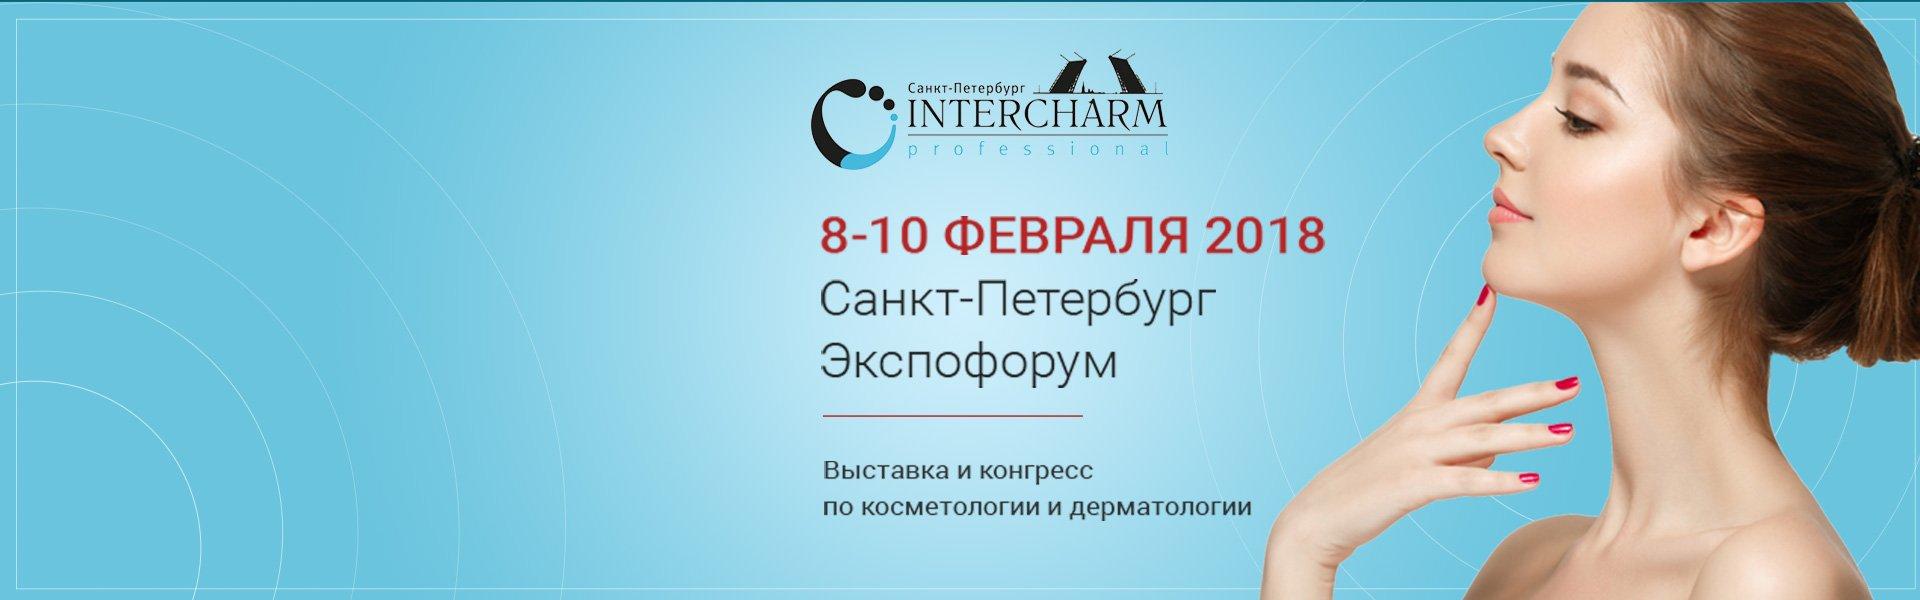 INTERCHARM 2018